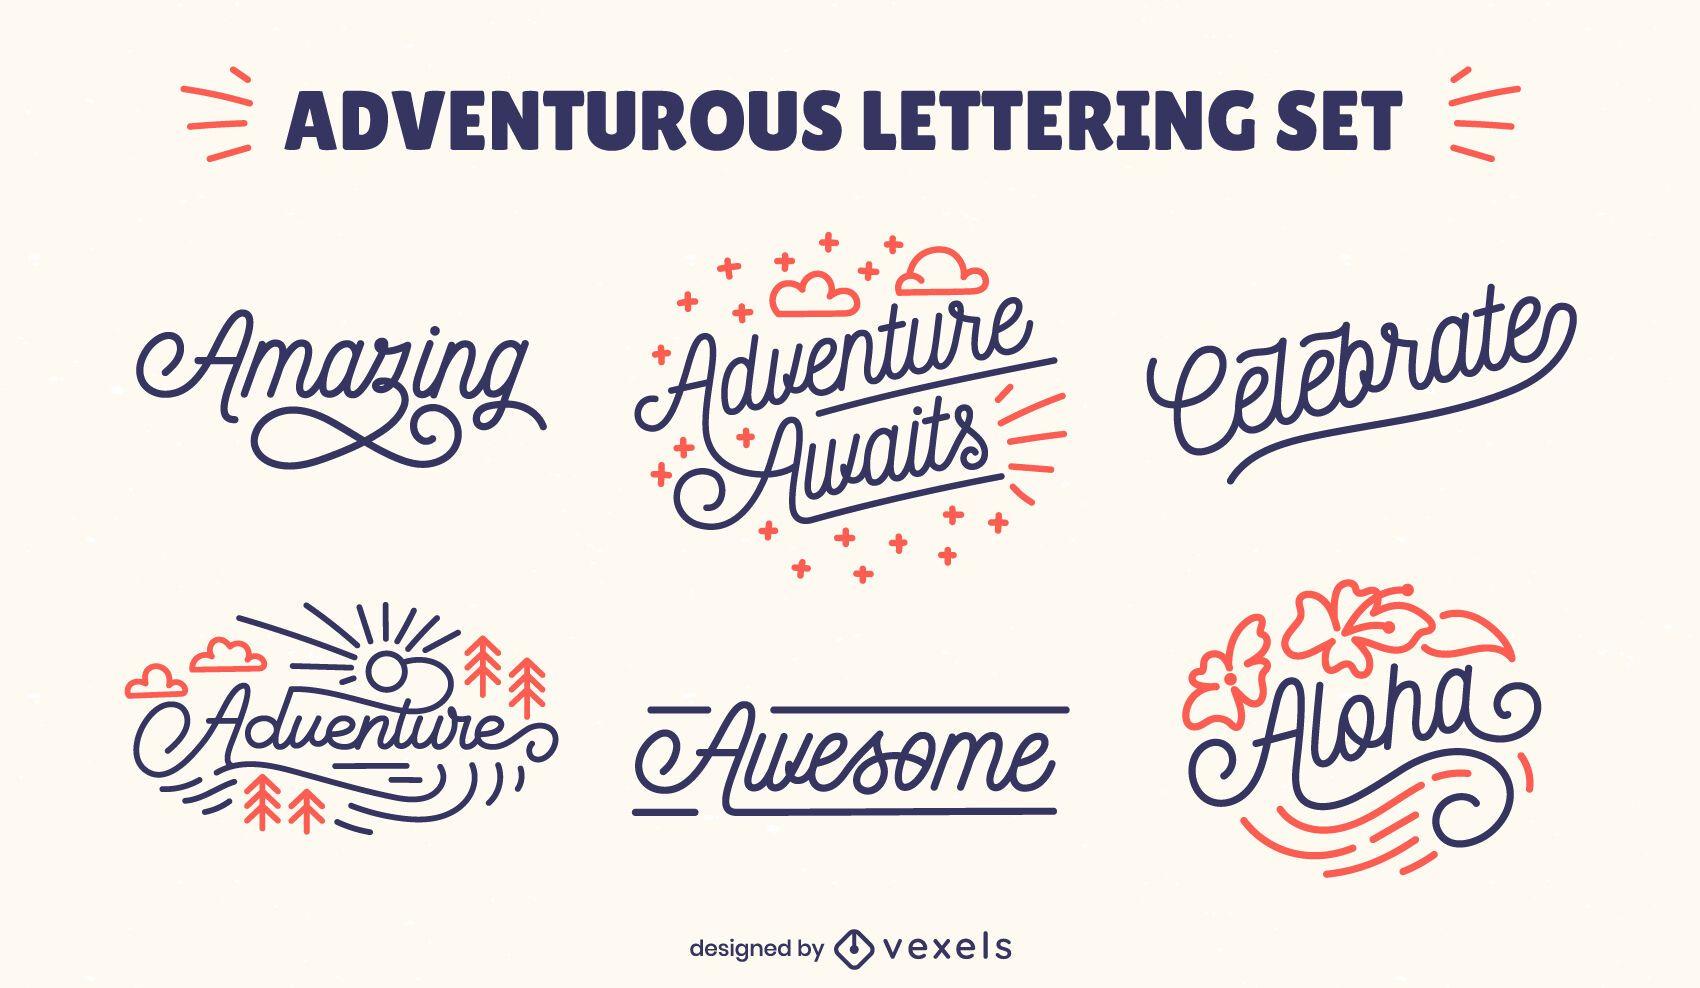 Adventurous lettering collection